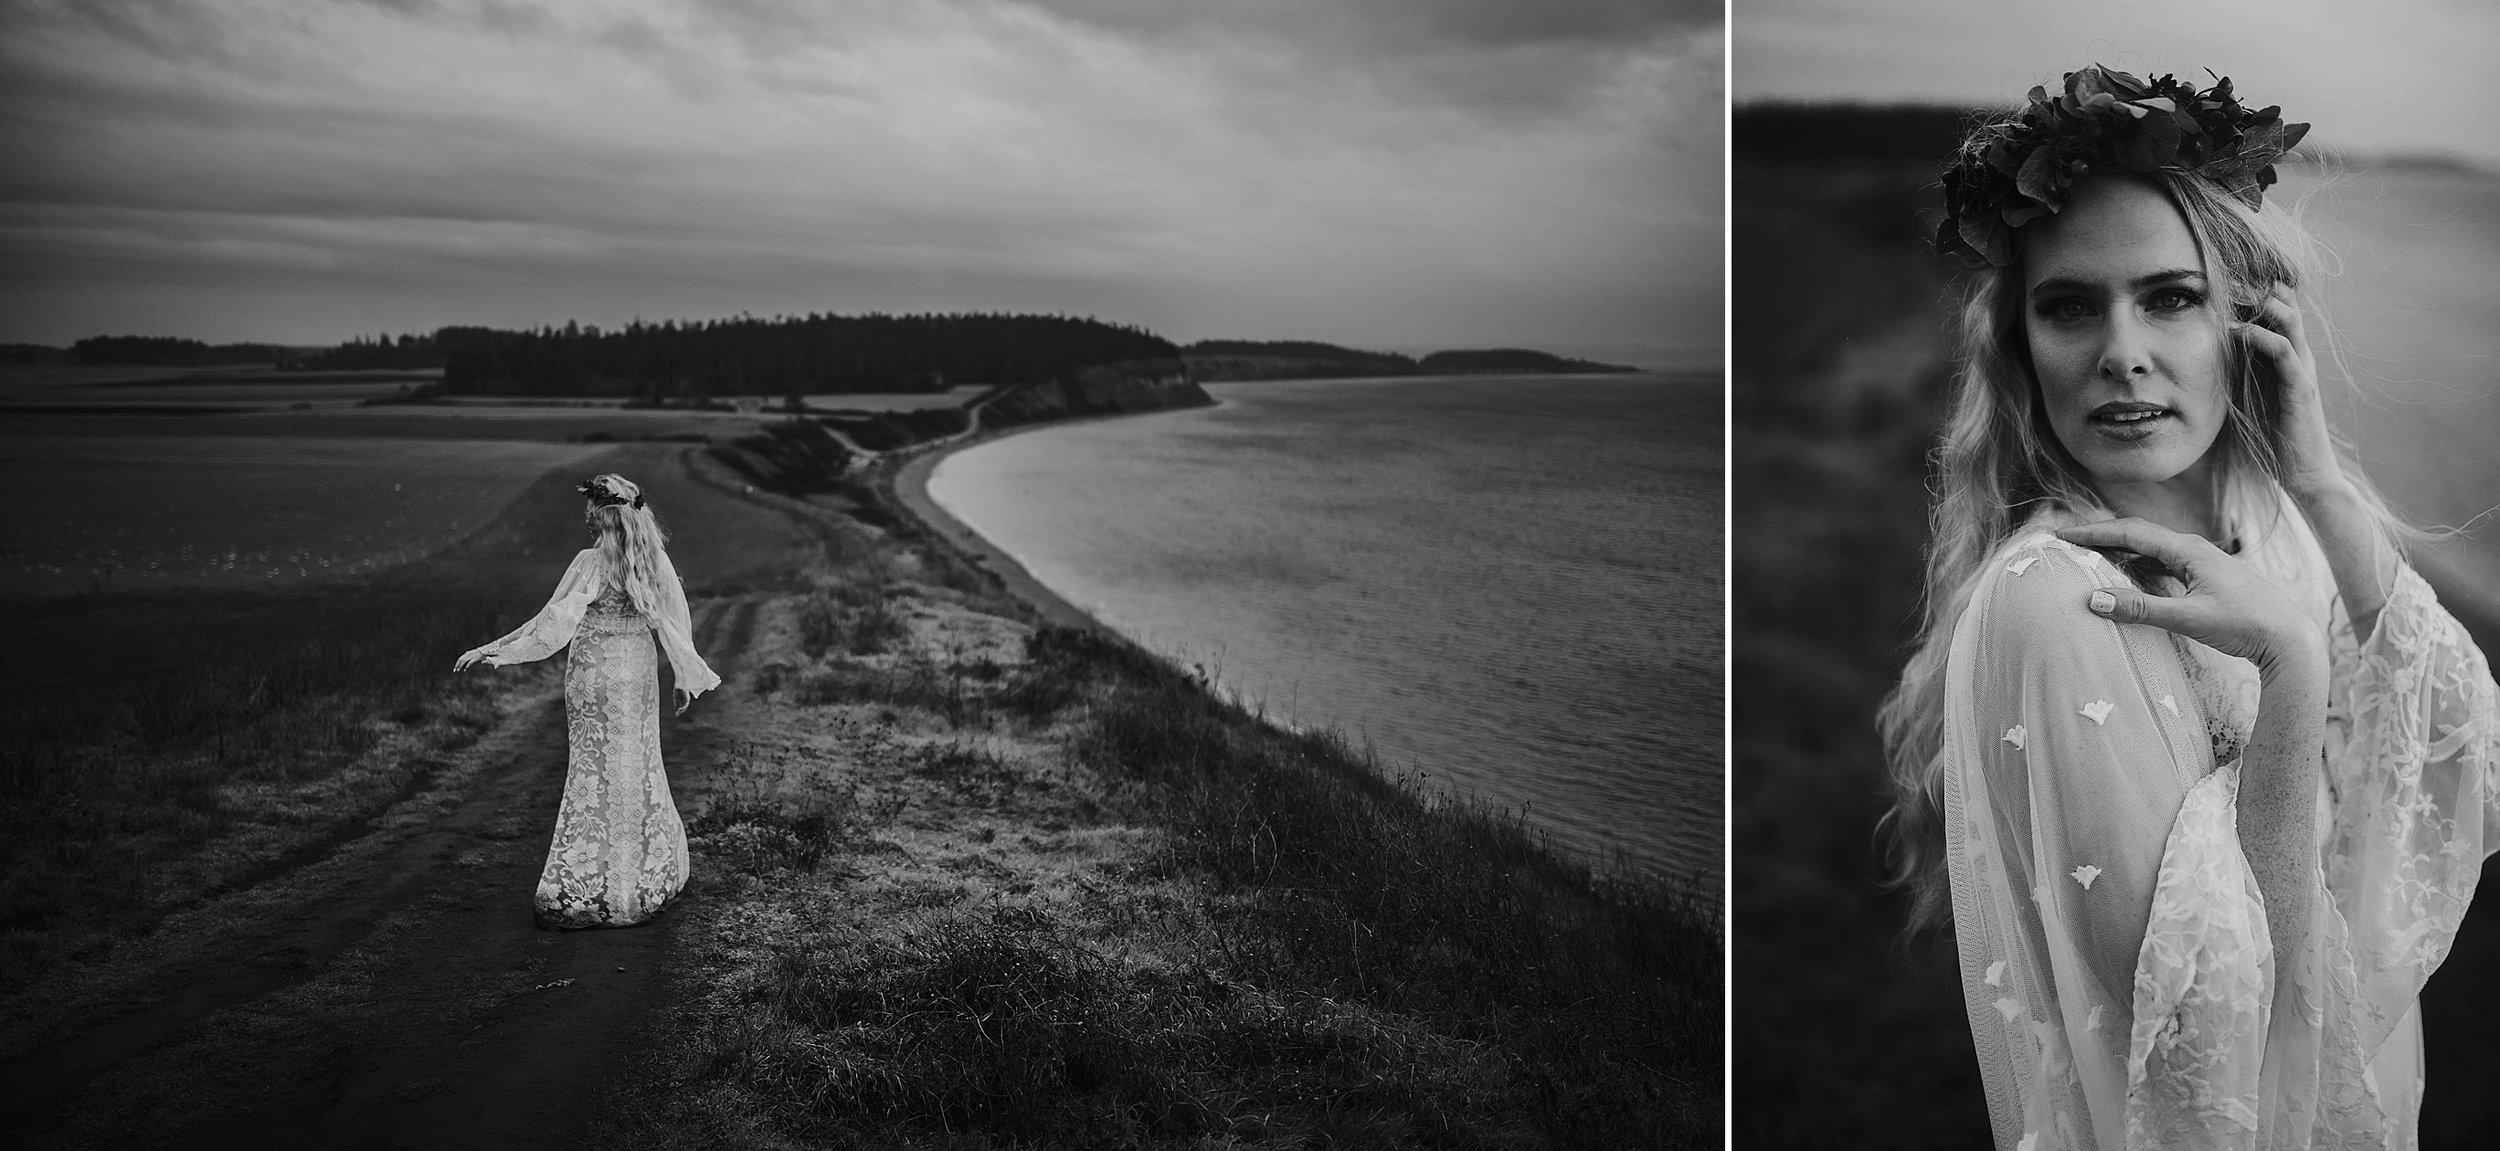 Wedding-photographer-J HODGES PHOTOGRAPHY_0223.jpg